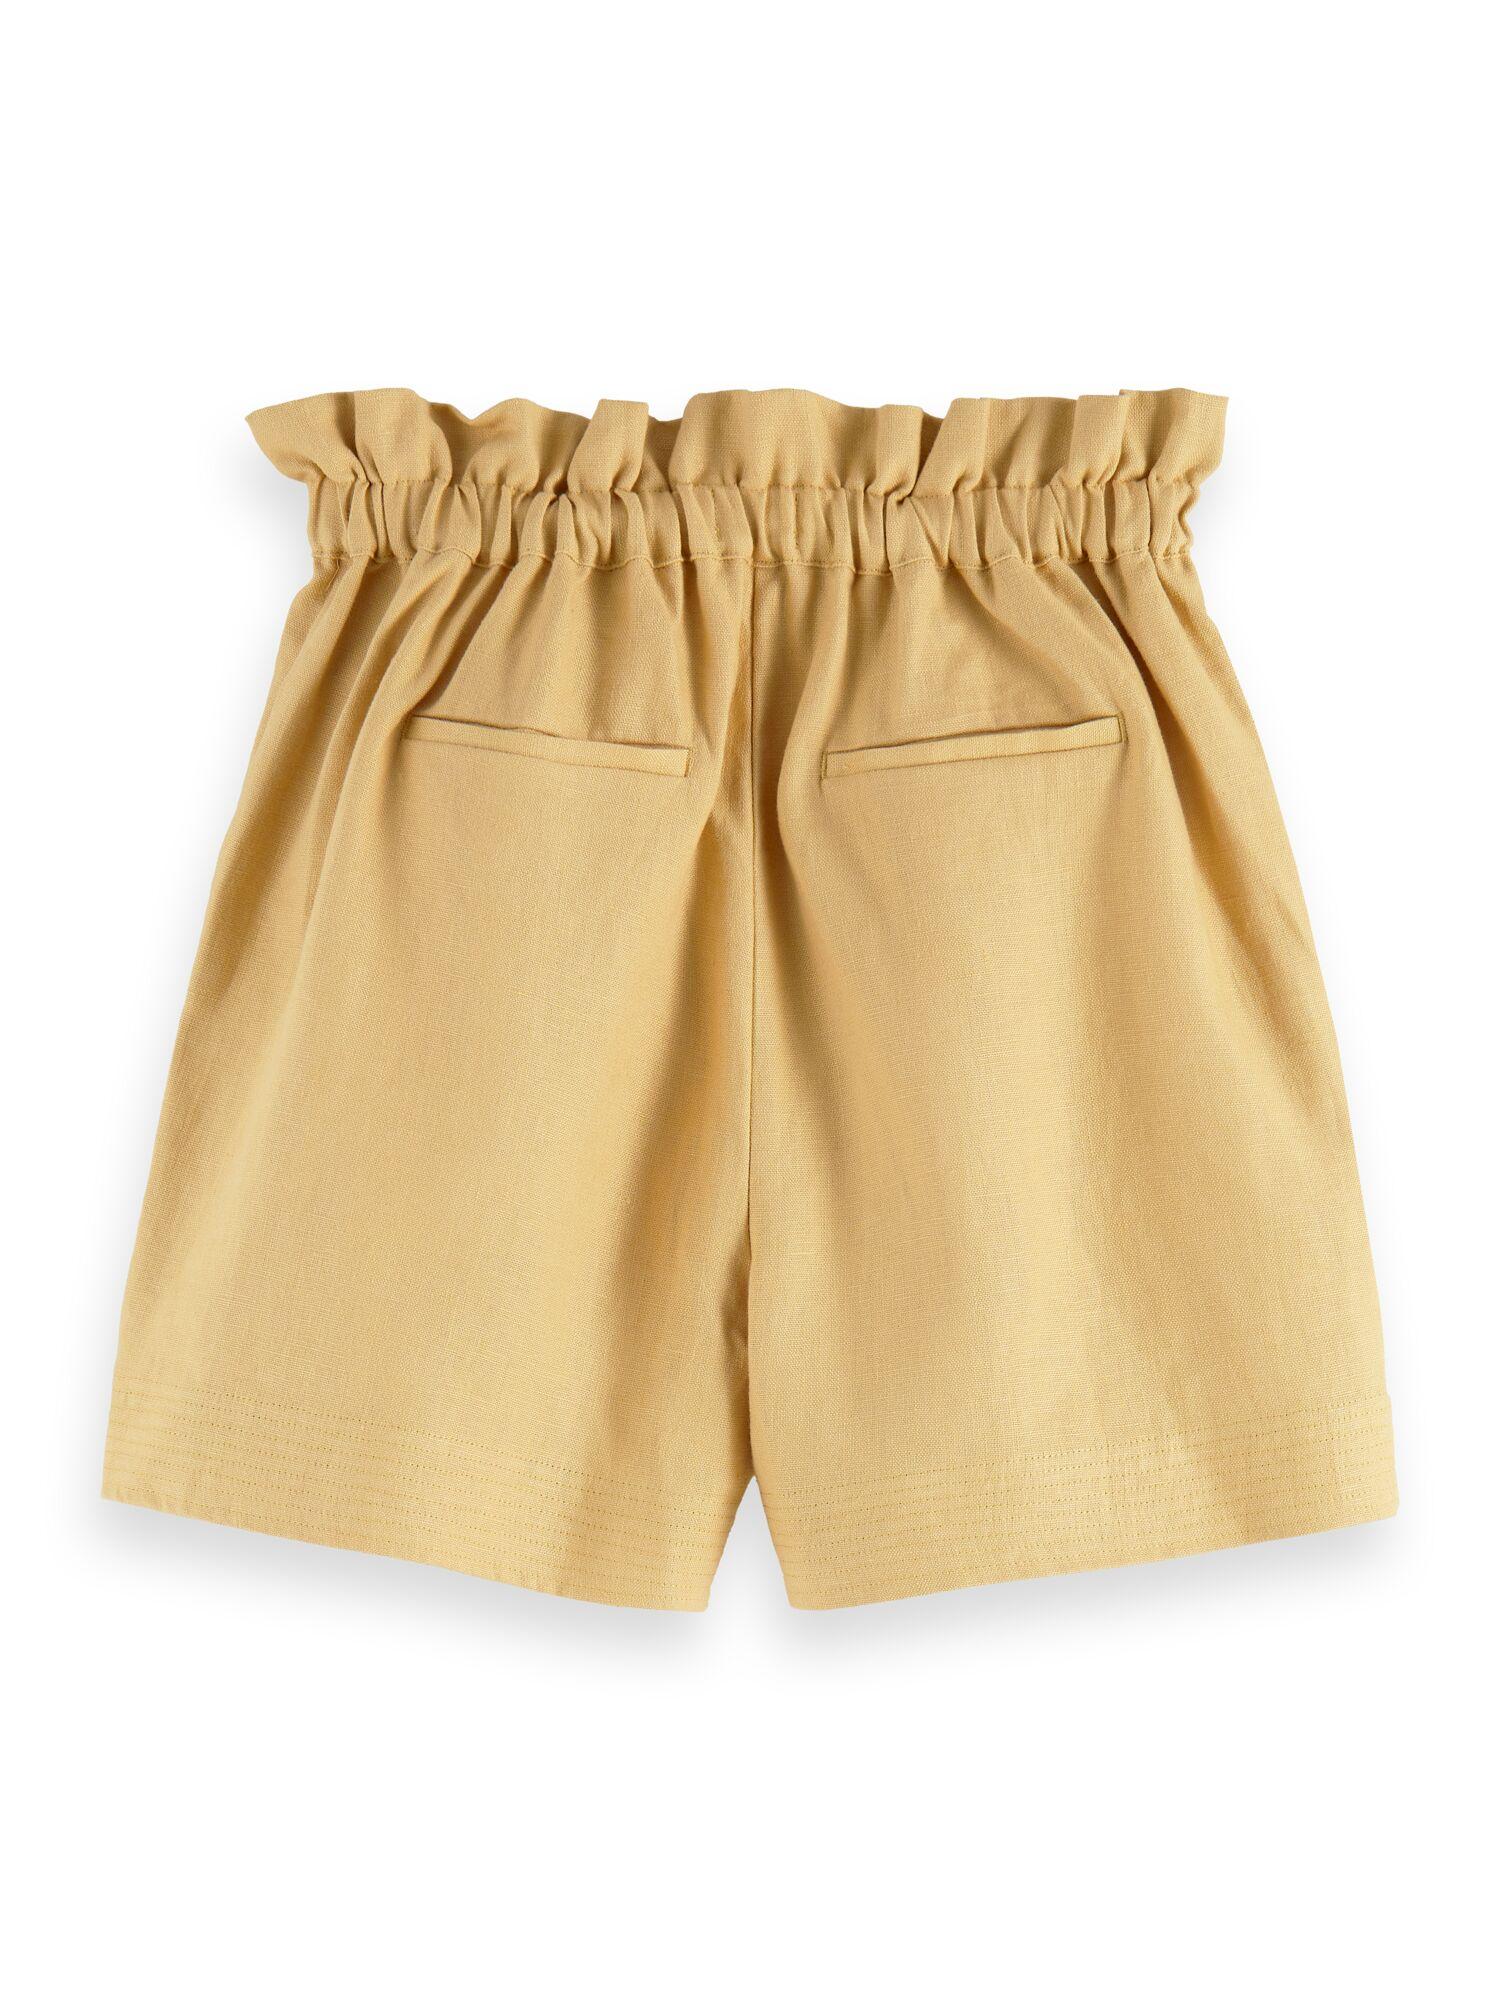 Scotch & Soda | Linen shorts with elasticated waist